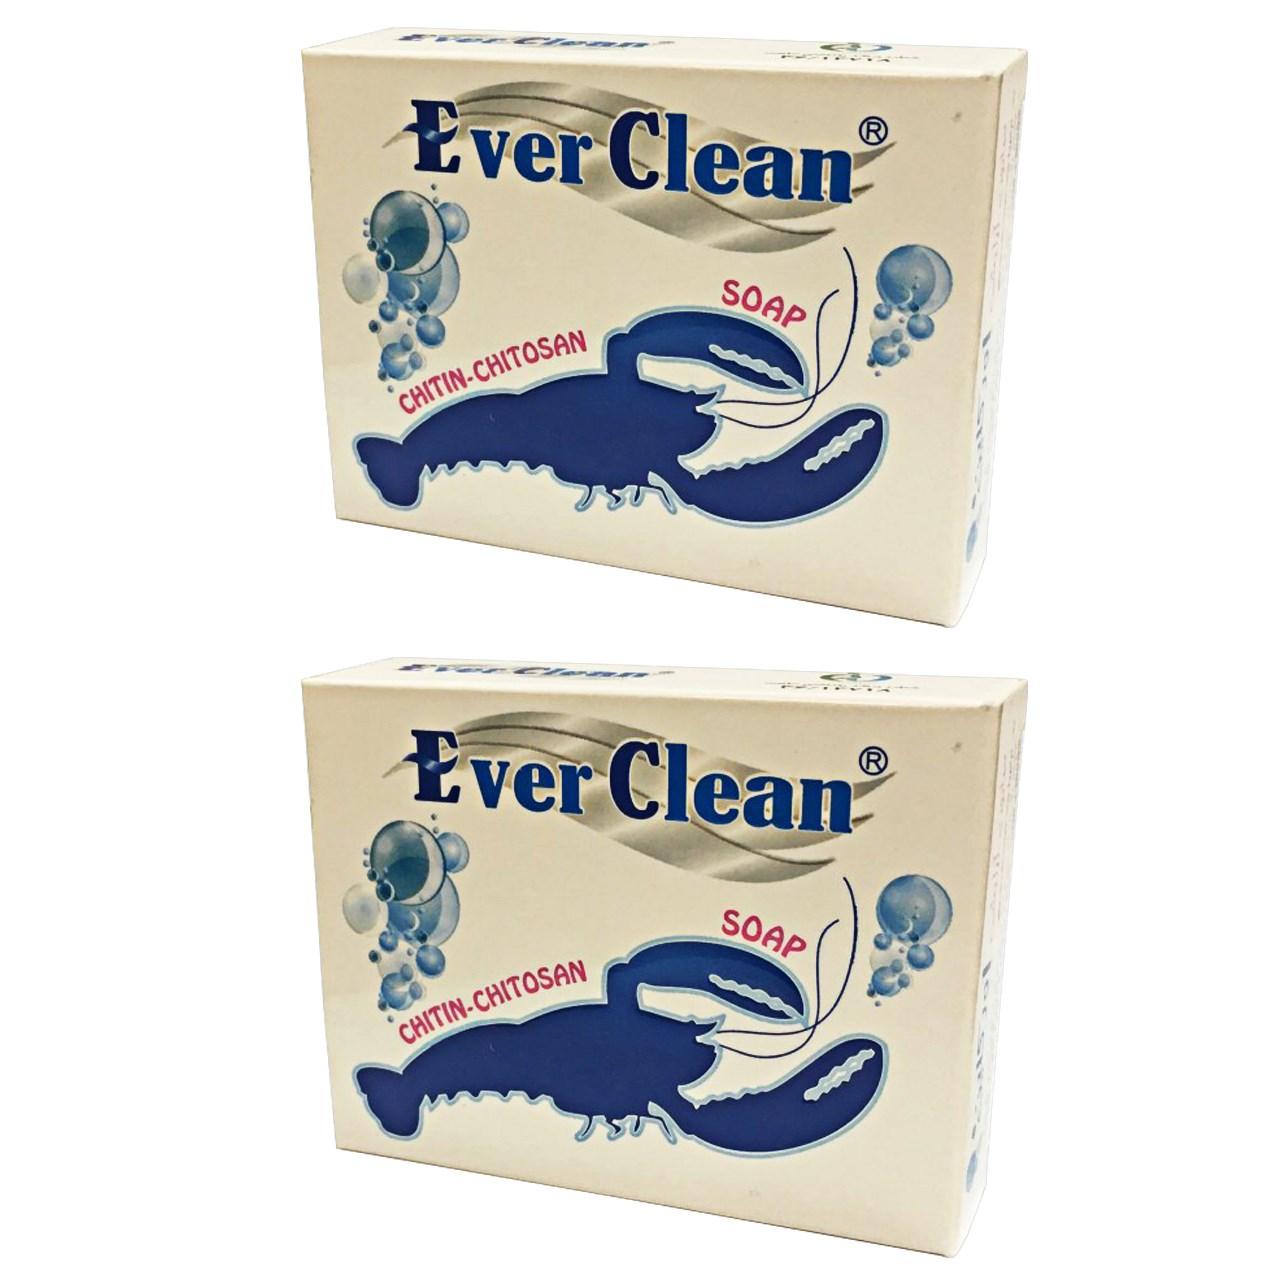 خرید                      صابون حاوی عصاره روغن خرچنگ اورکلین مدل Beauty مجموعه 2 عددی حجم 70 گرم